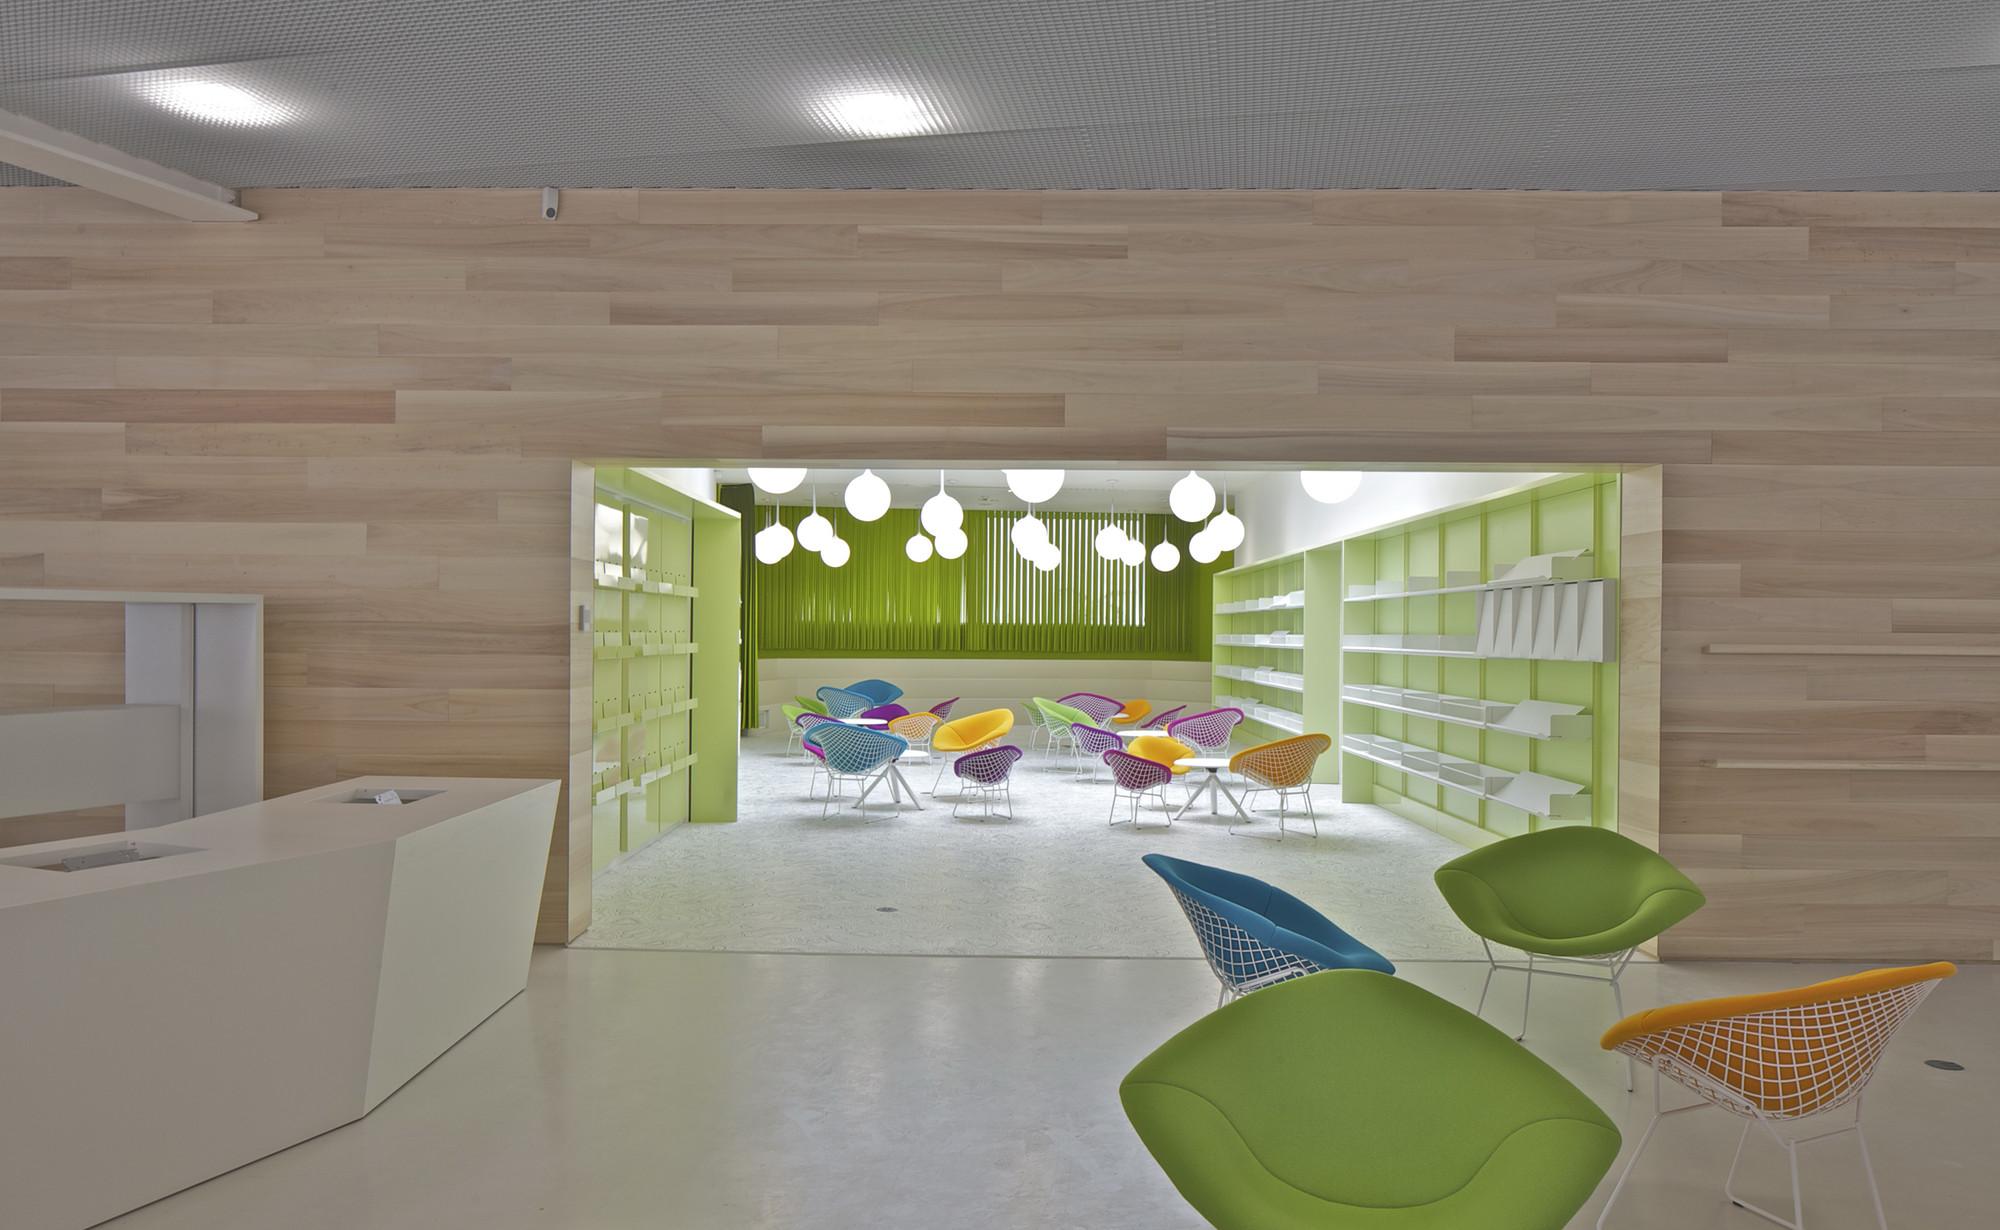 gallery of lons le saunier mediatheque du besset lyon architectes 20. Black Bedroom Furniture Sets. Home Design Ideas